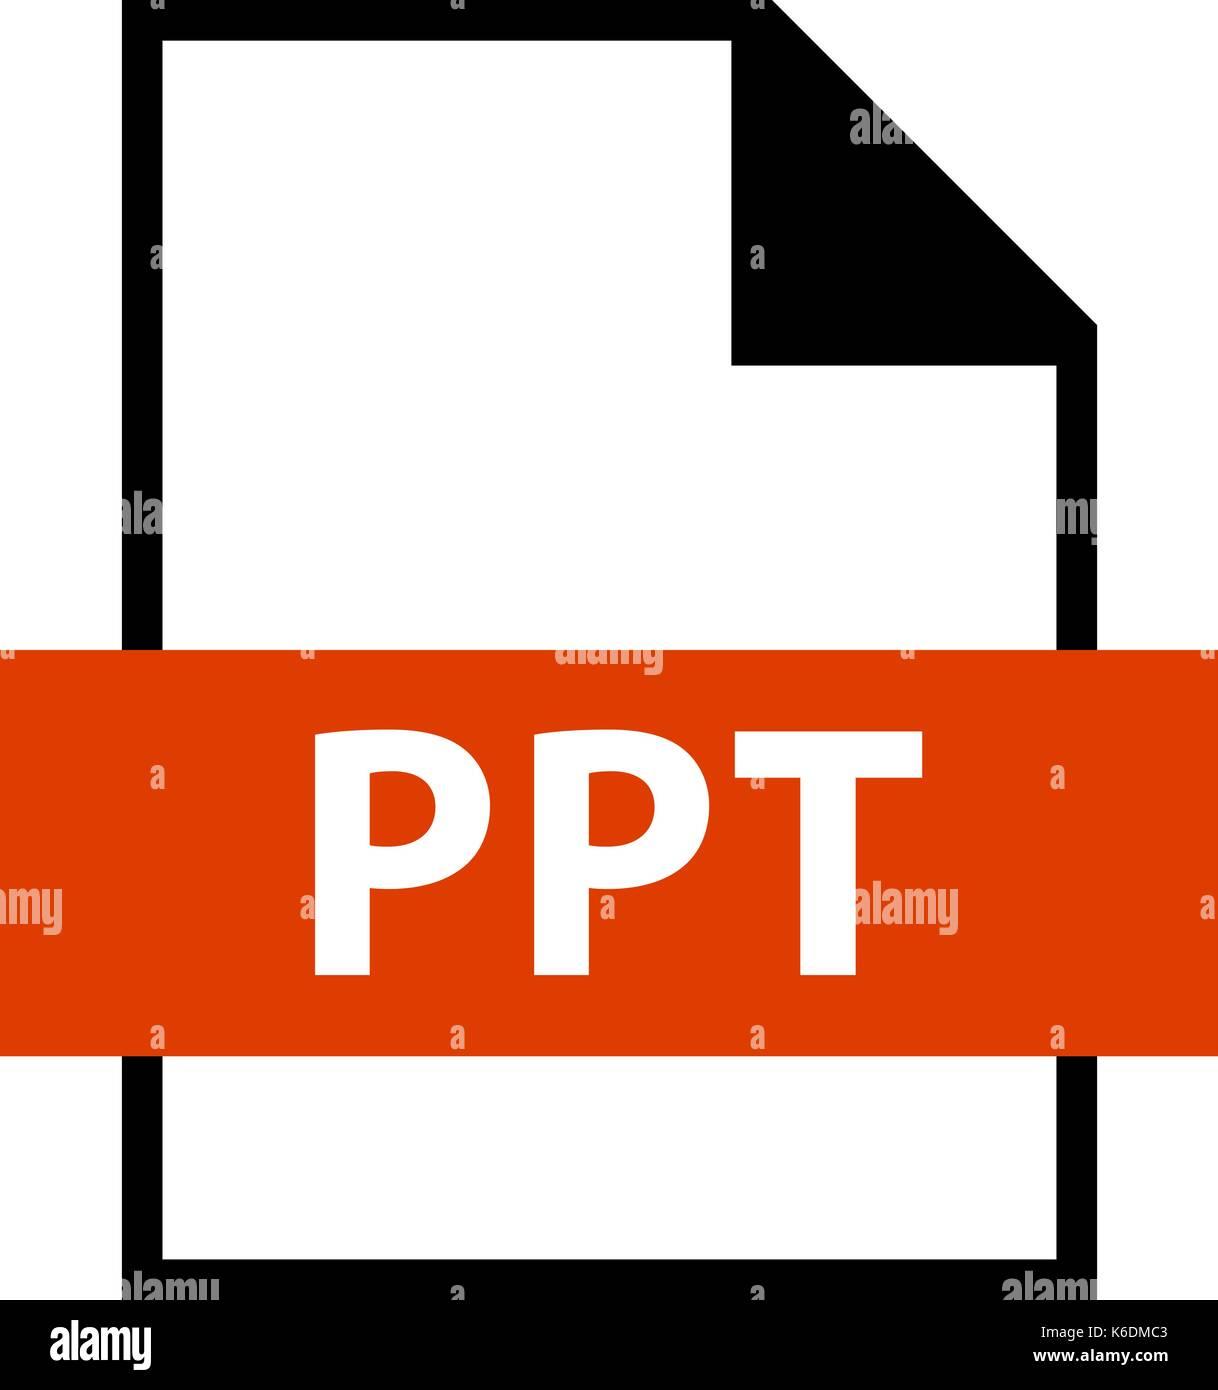 Powerpoint Stockfotos & Powerpoint Bilder - Alamy